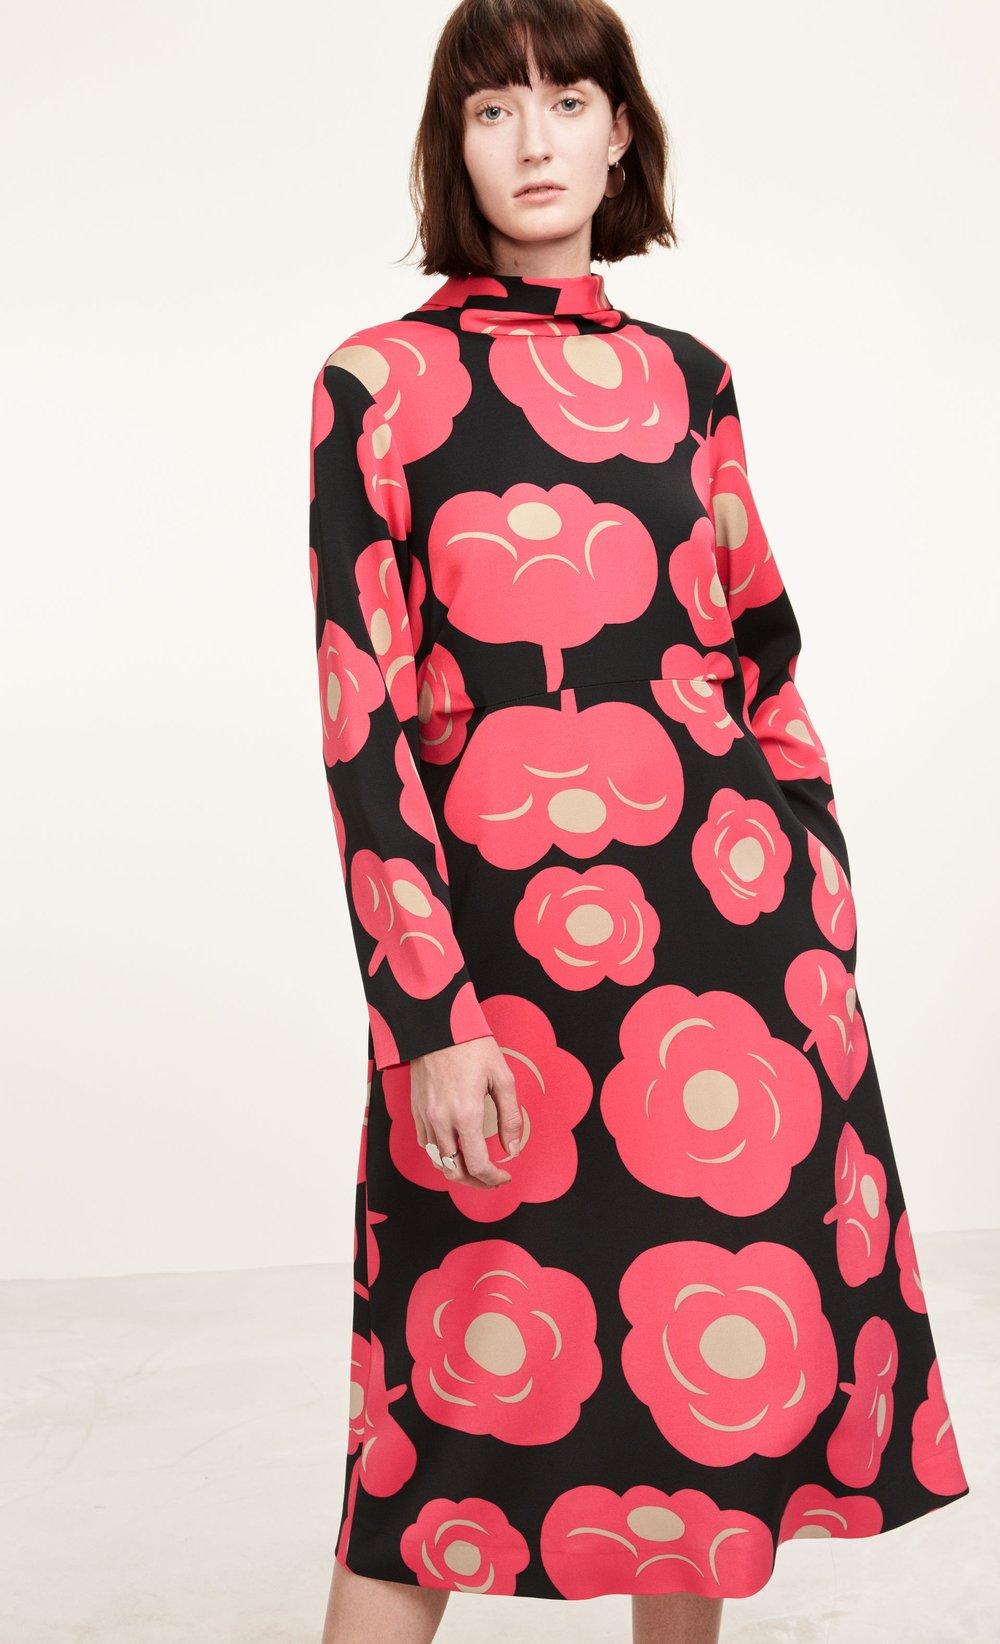 Marimekko Oona Tumma dress. Marimekko. $465 + additional 20% off.